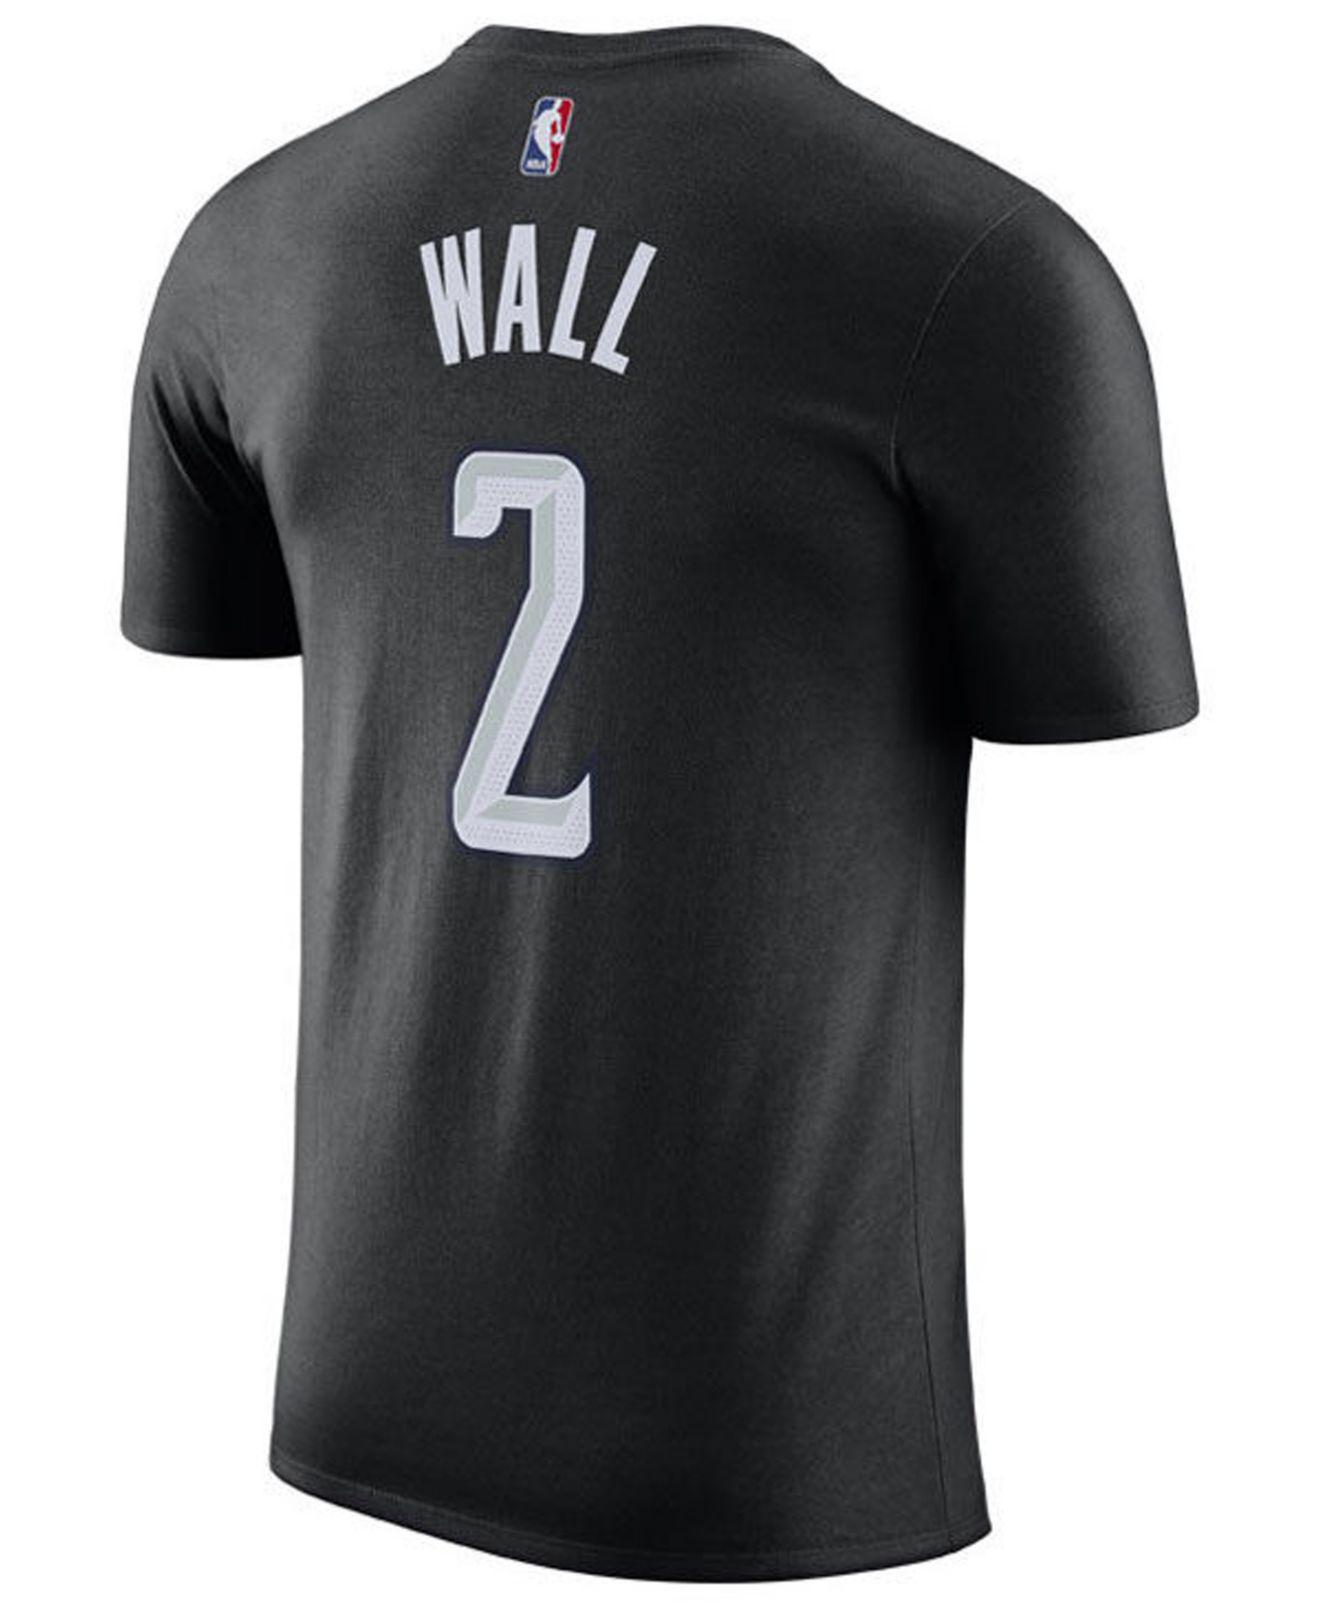 0b6f3e3c7 Nike John Wall Washington Wizards City Player T-shirt 2018 in Black for Men  - Lyst